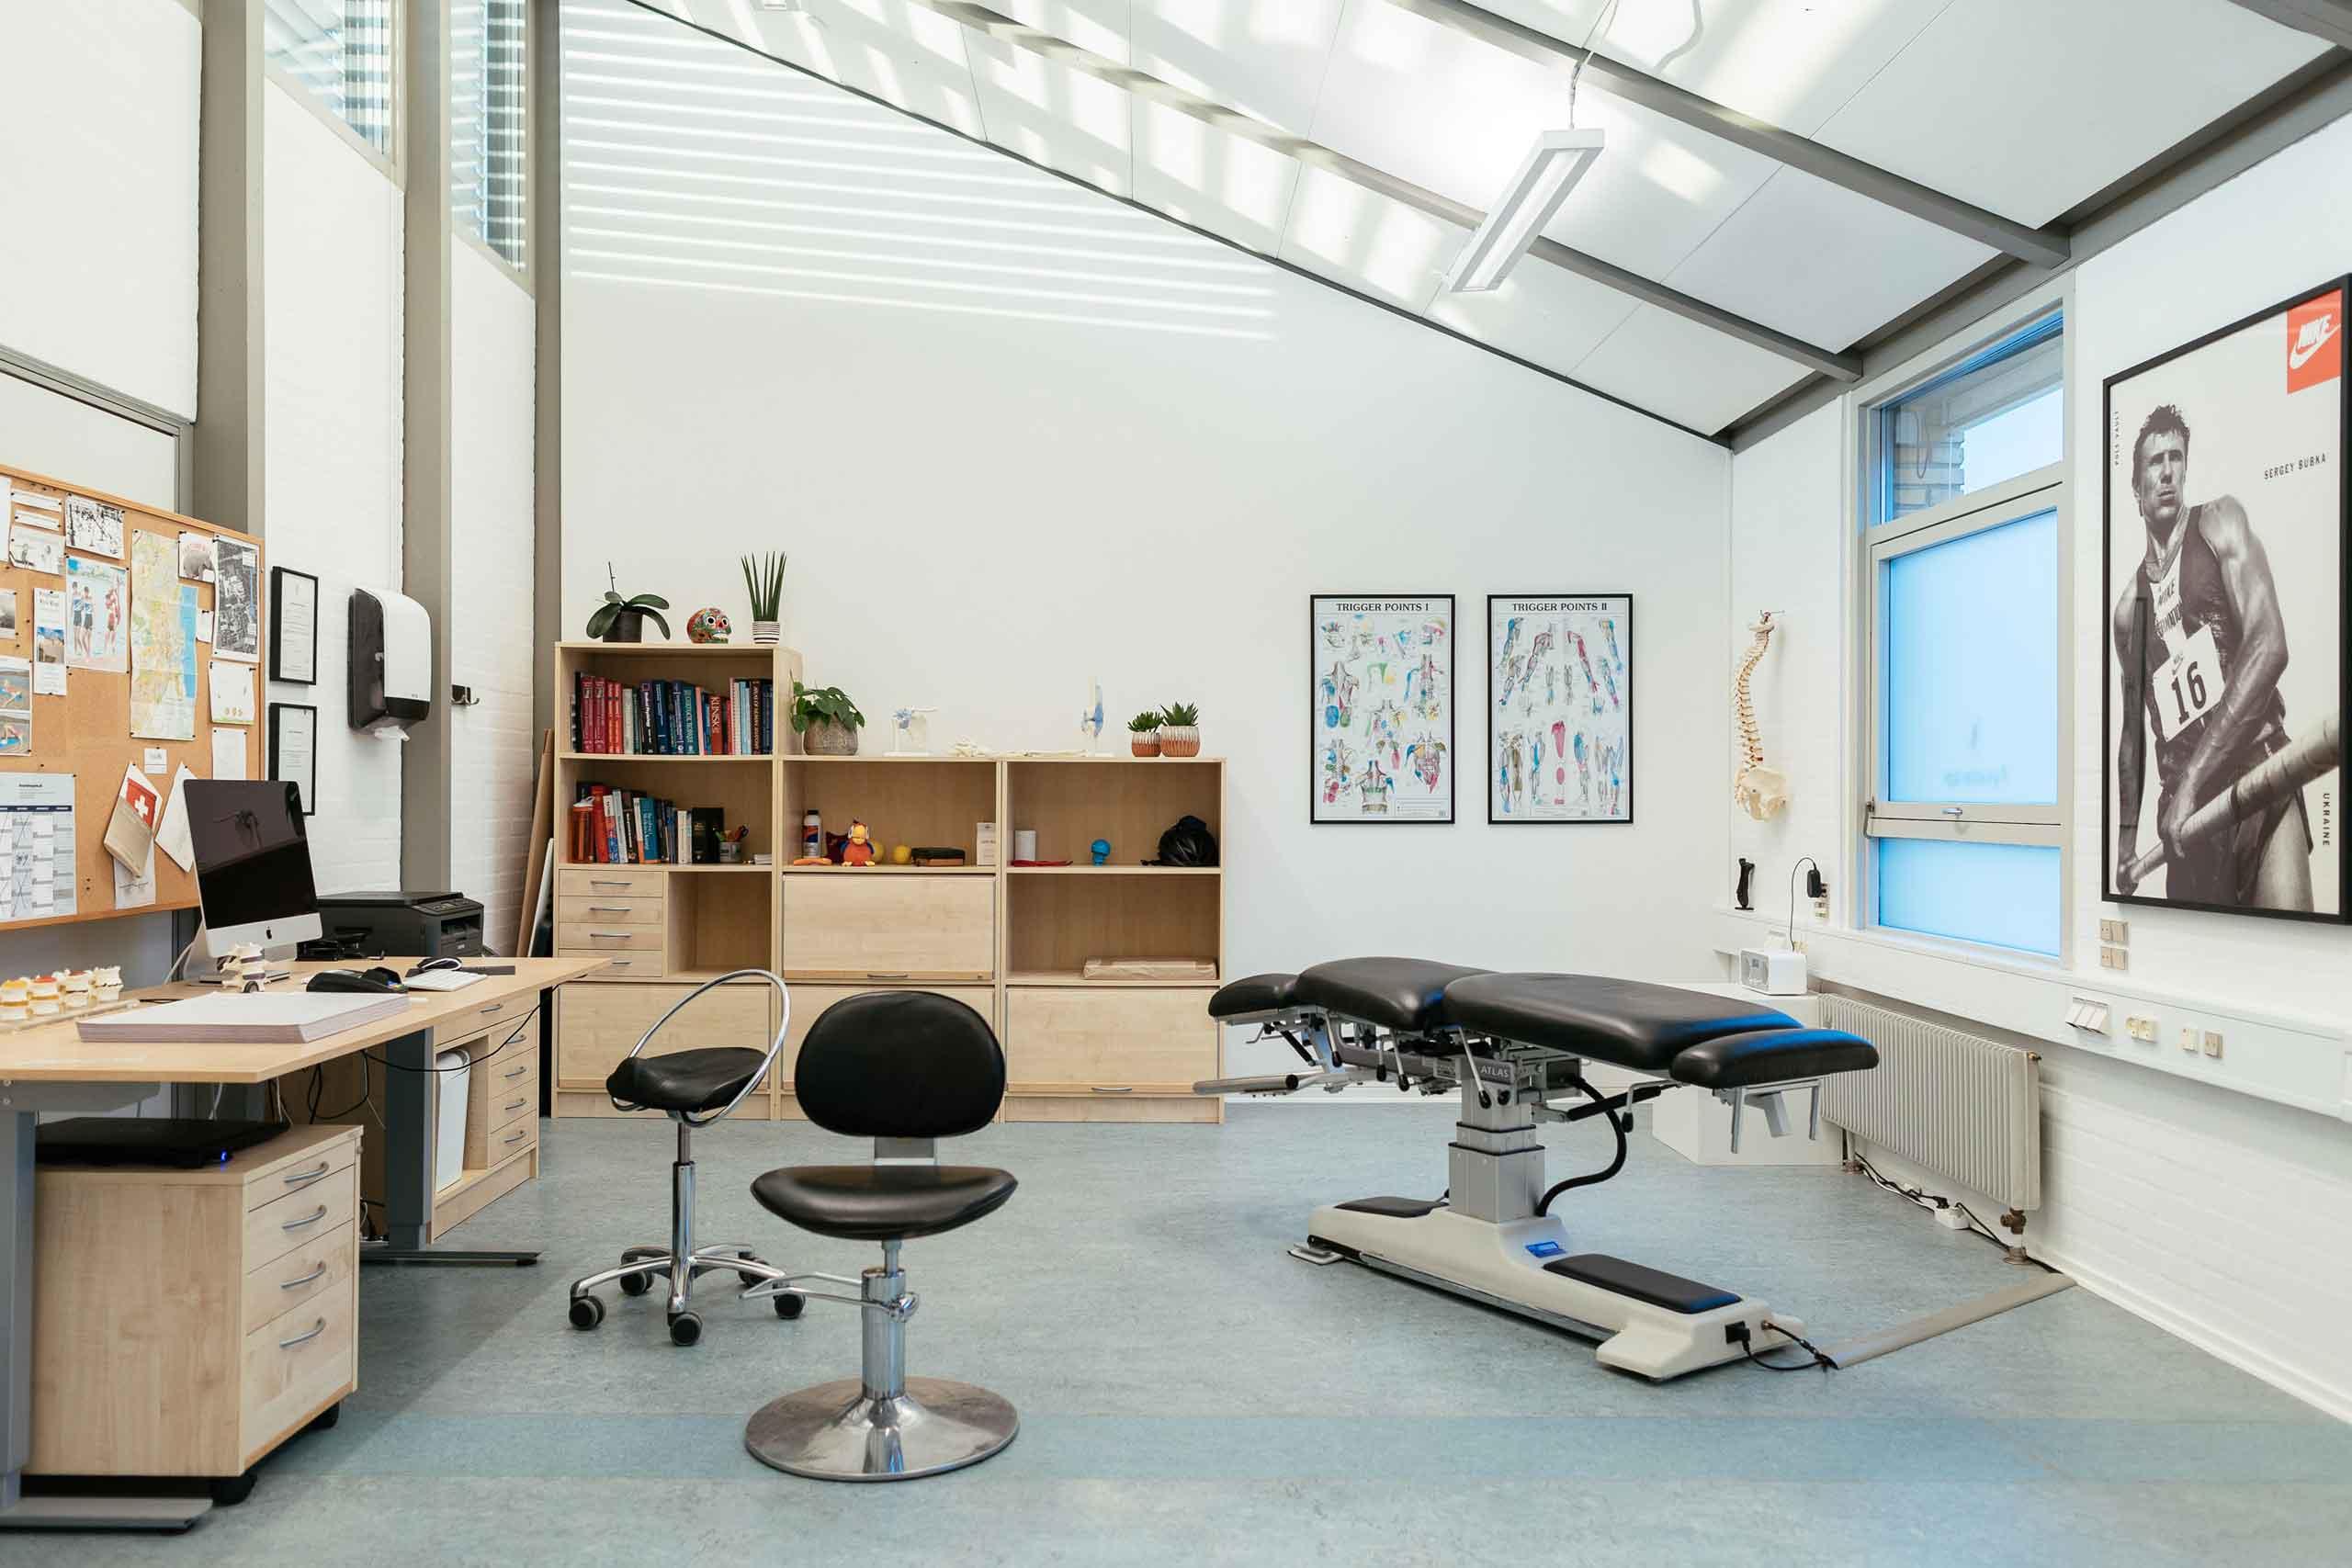 kiropraktor køge erfaring behandling priser tidsbestilling kontakt